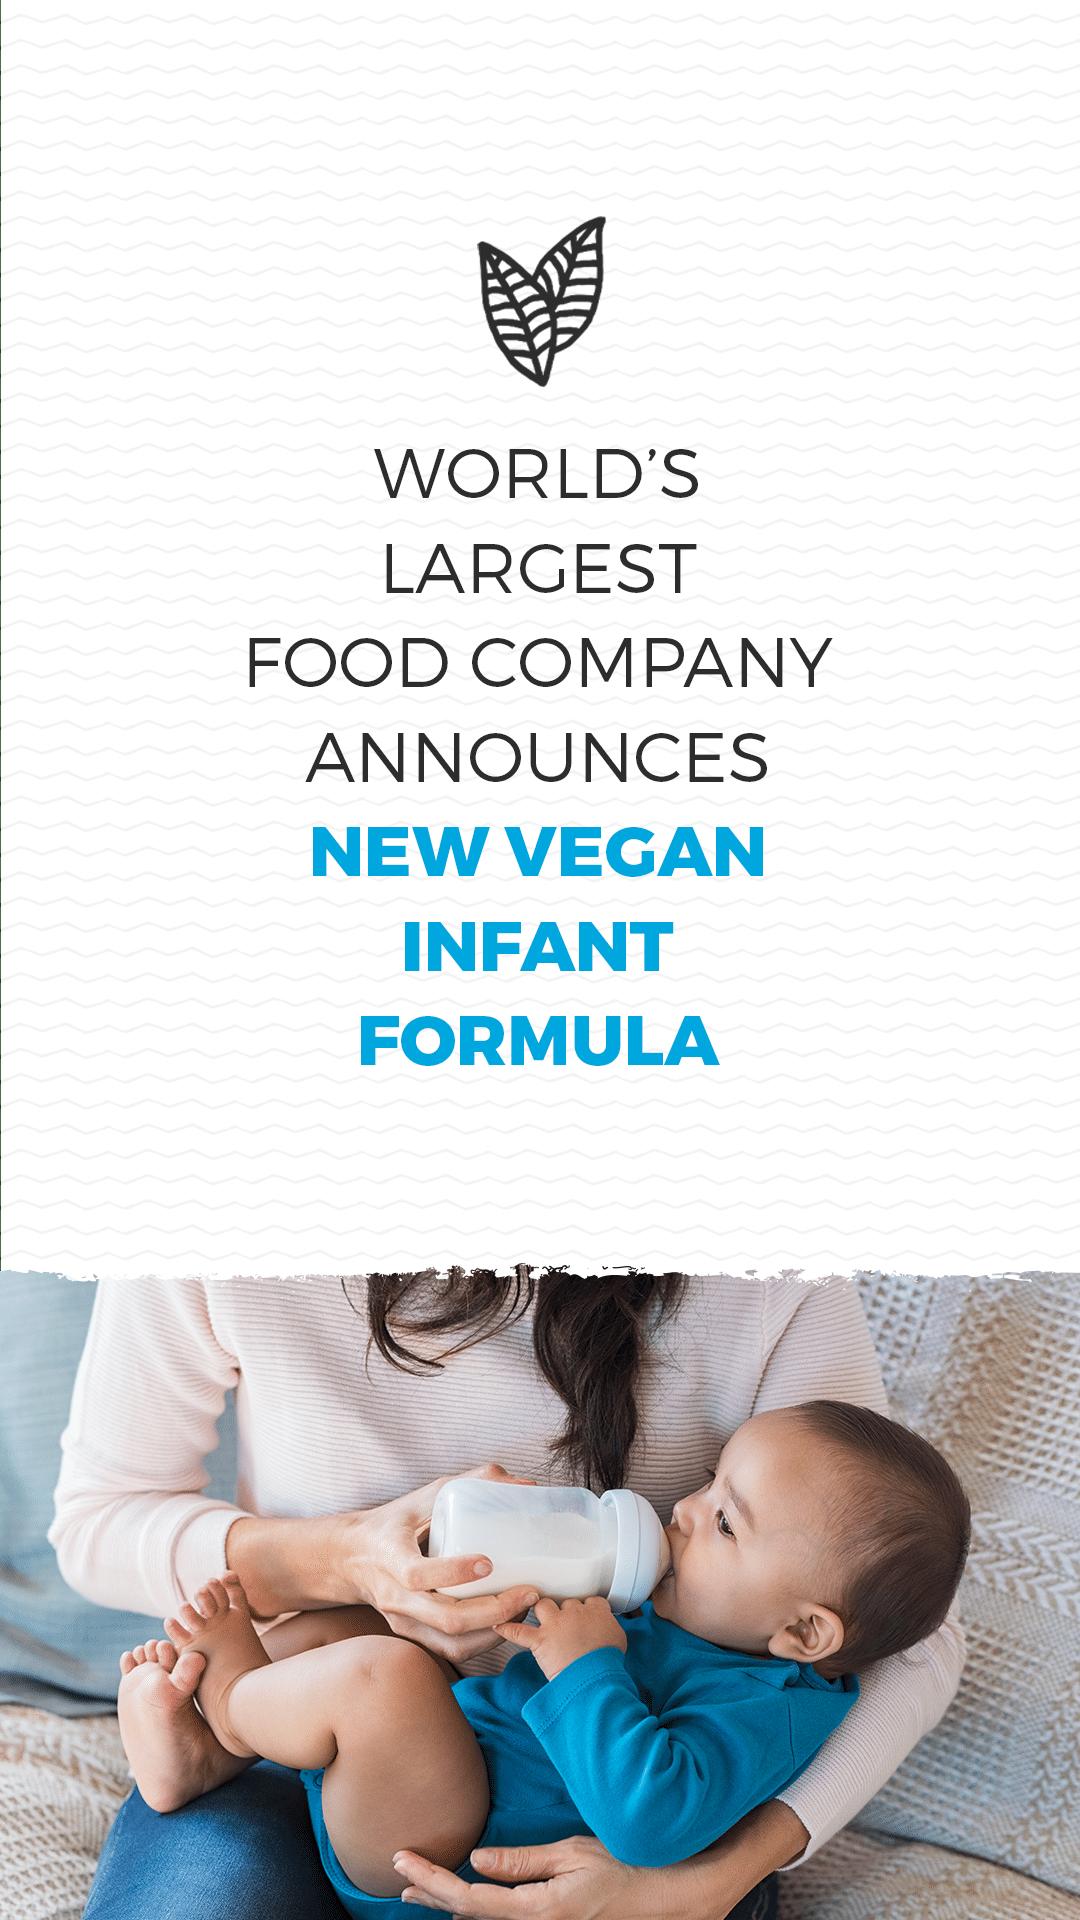 World's Largest Food Company Announces New Vegan Infant Formula